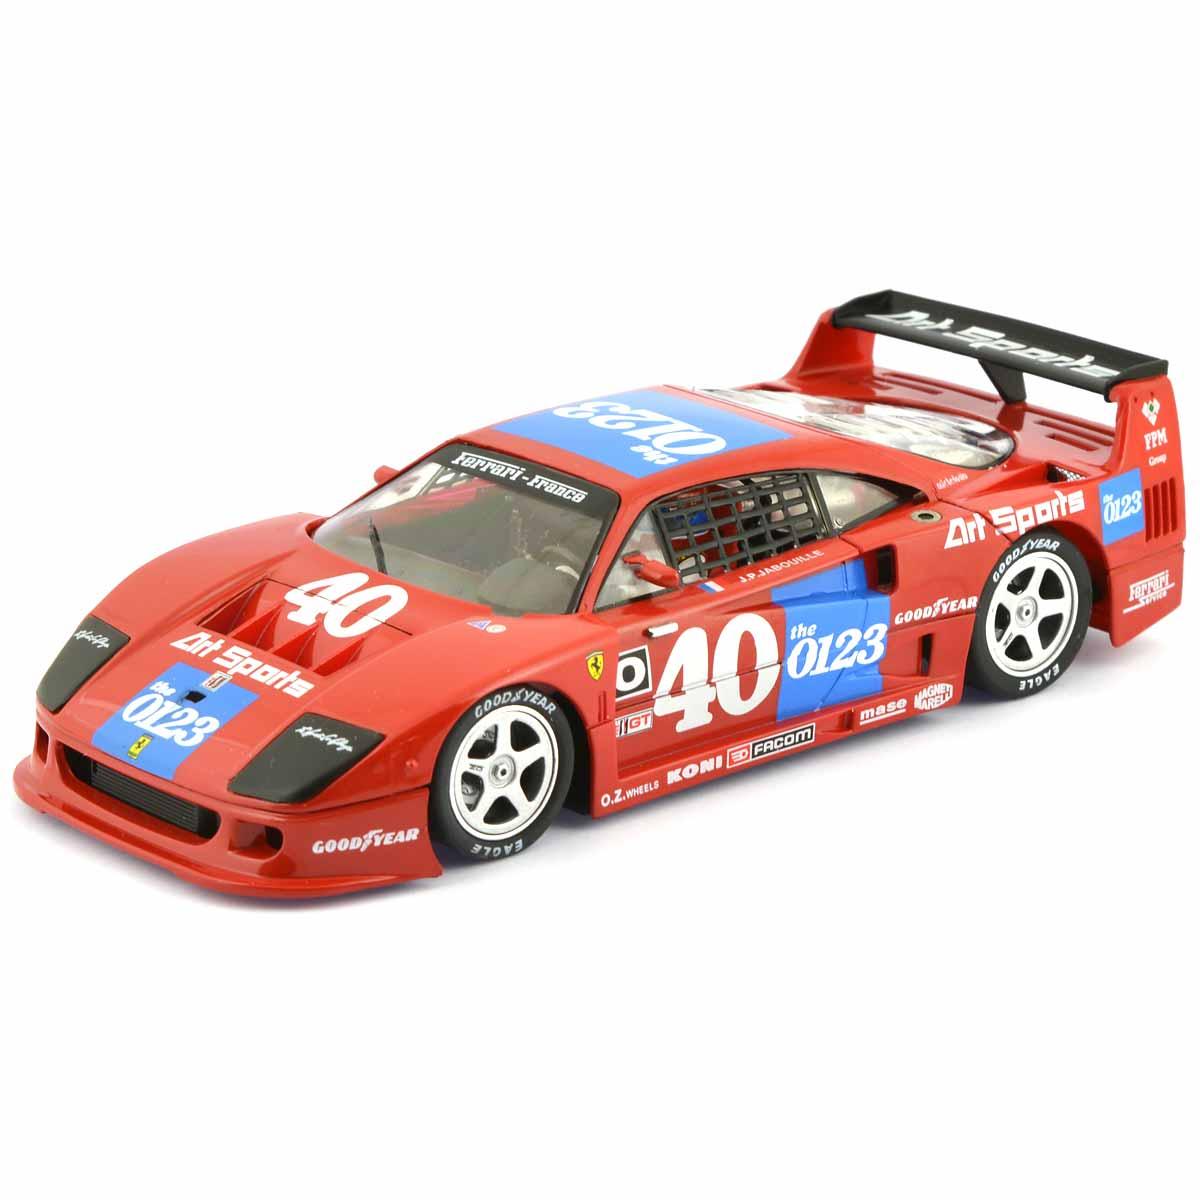 Ferrari F40: Policar Ferrari F40 No.40 IMSA GTO Road America 1990 (PC